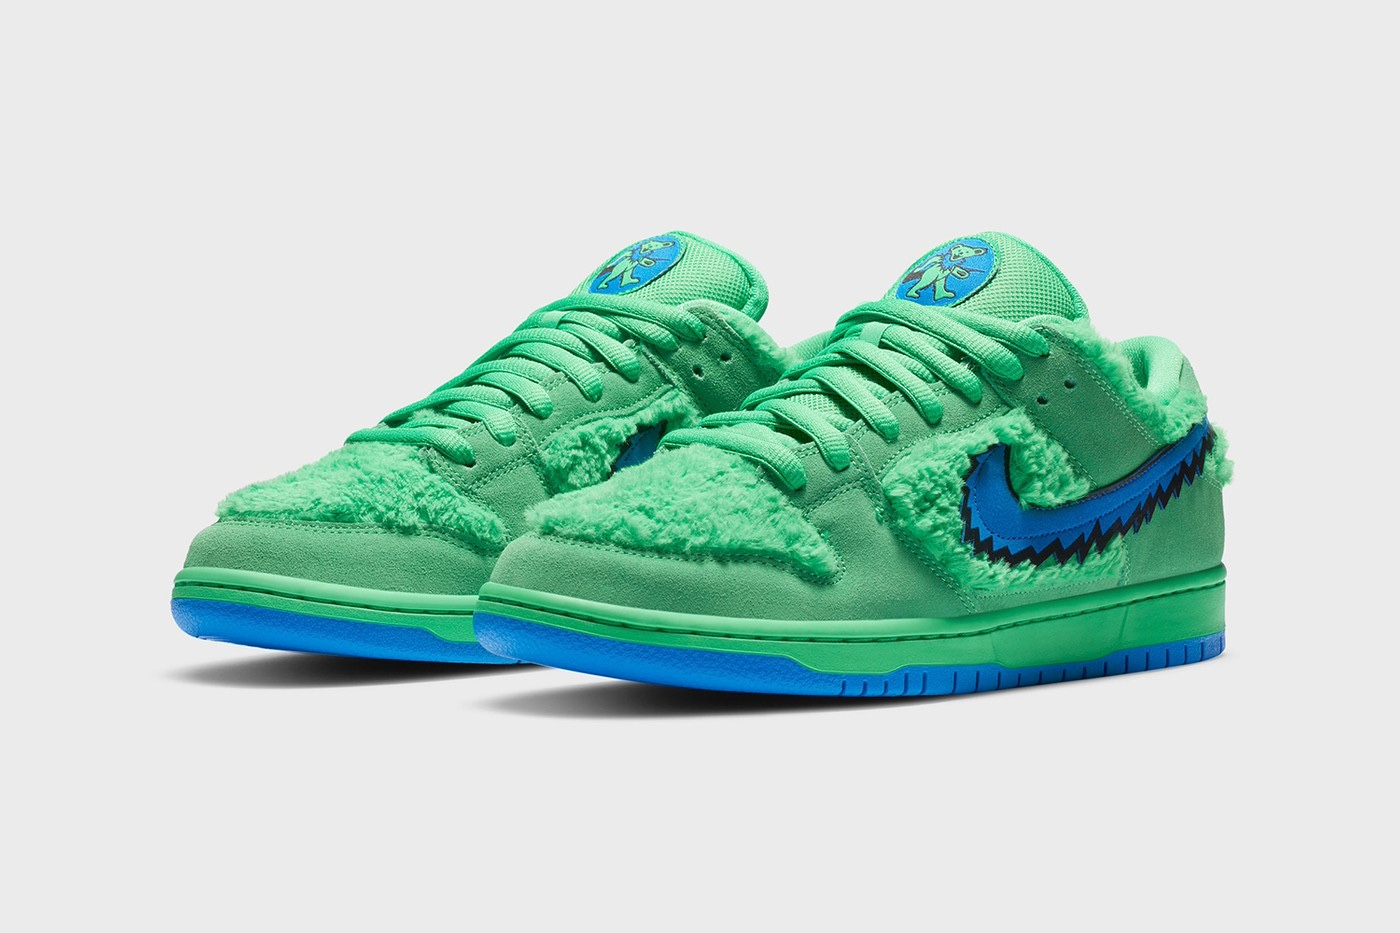 Versione Verde Nike SB Dunk Low Grateful Dead